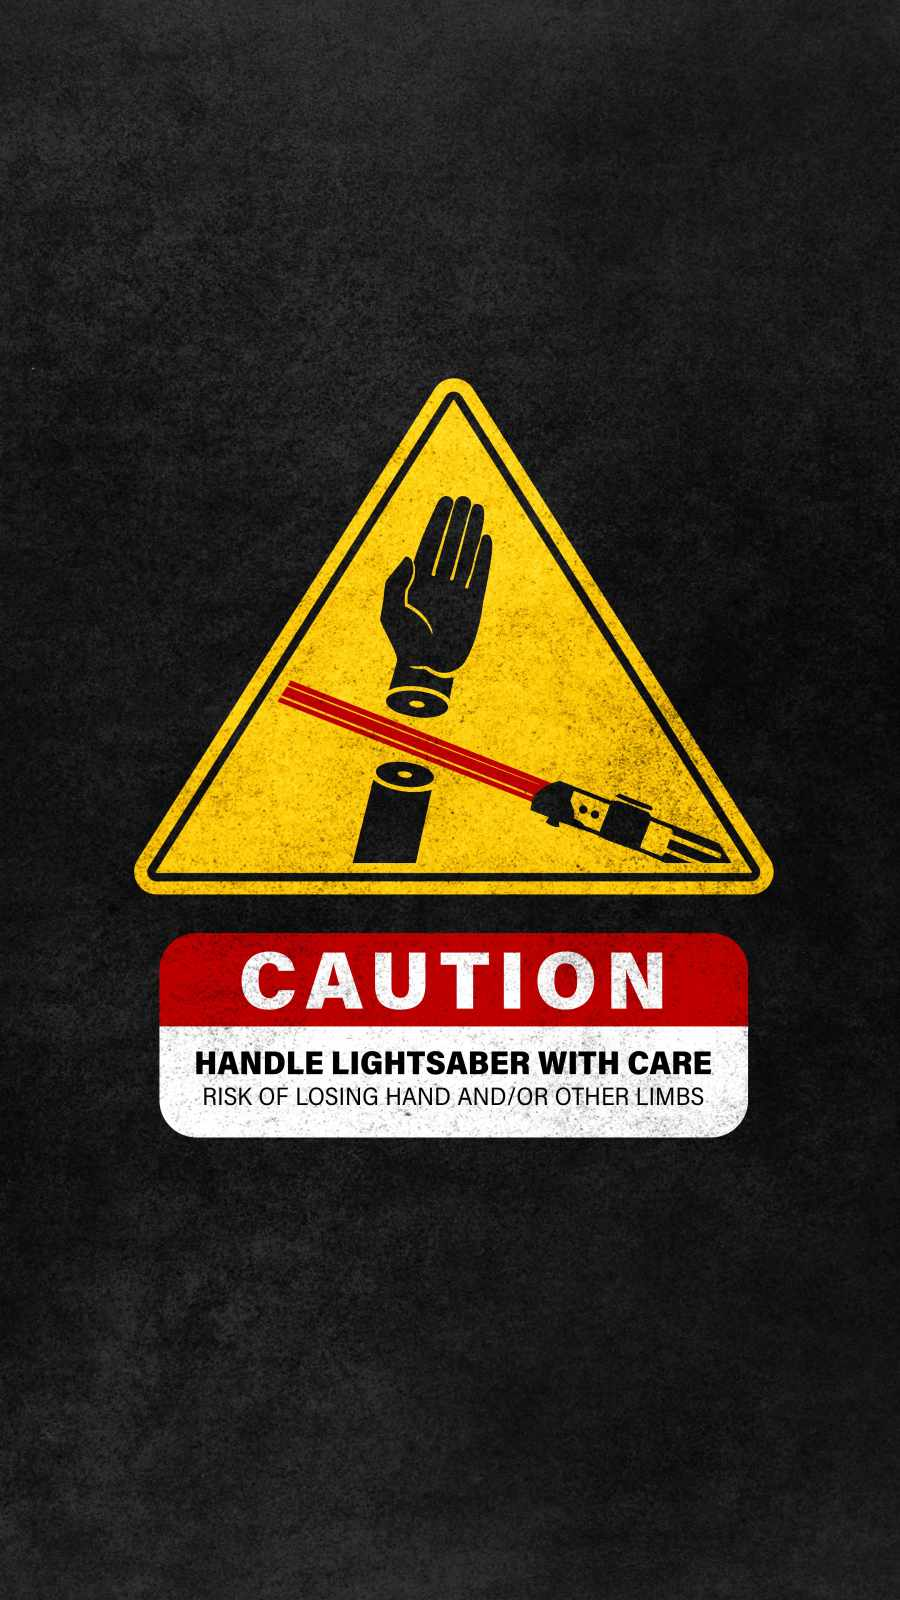 Lightsaber Caution